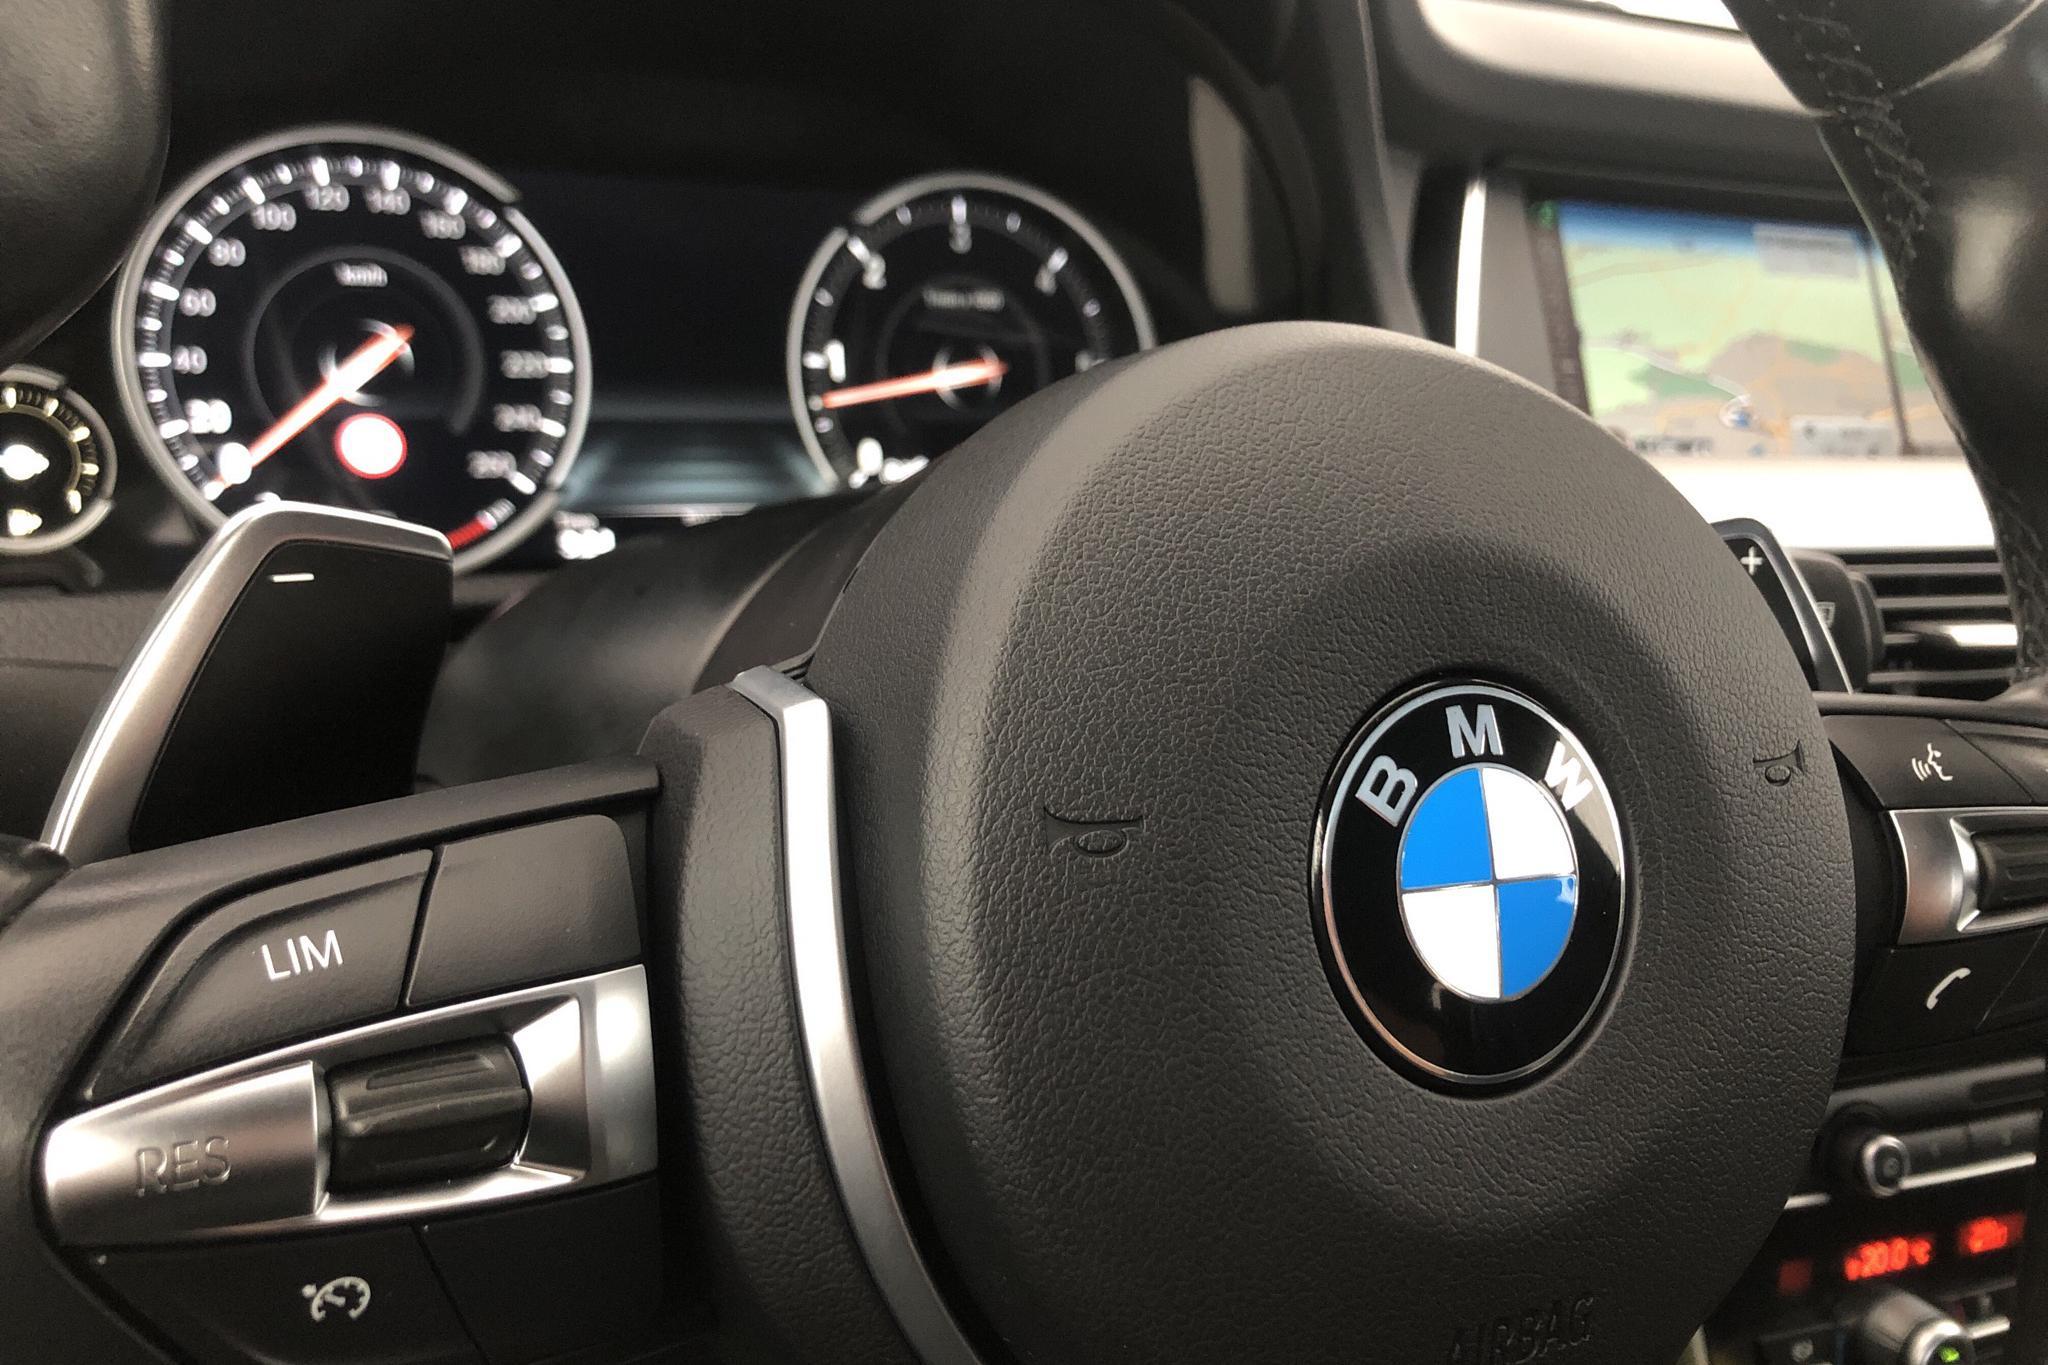 BMW 530d GT xDrive, F07 (258hk) - 71 030 km - Automatic - gray - 2016